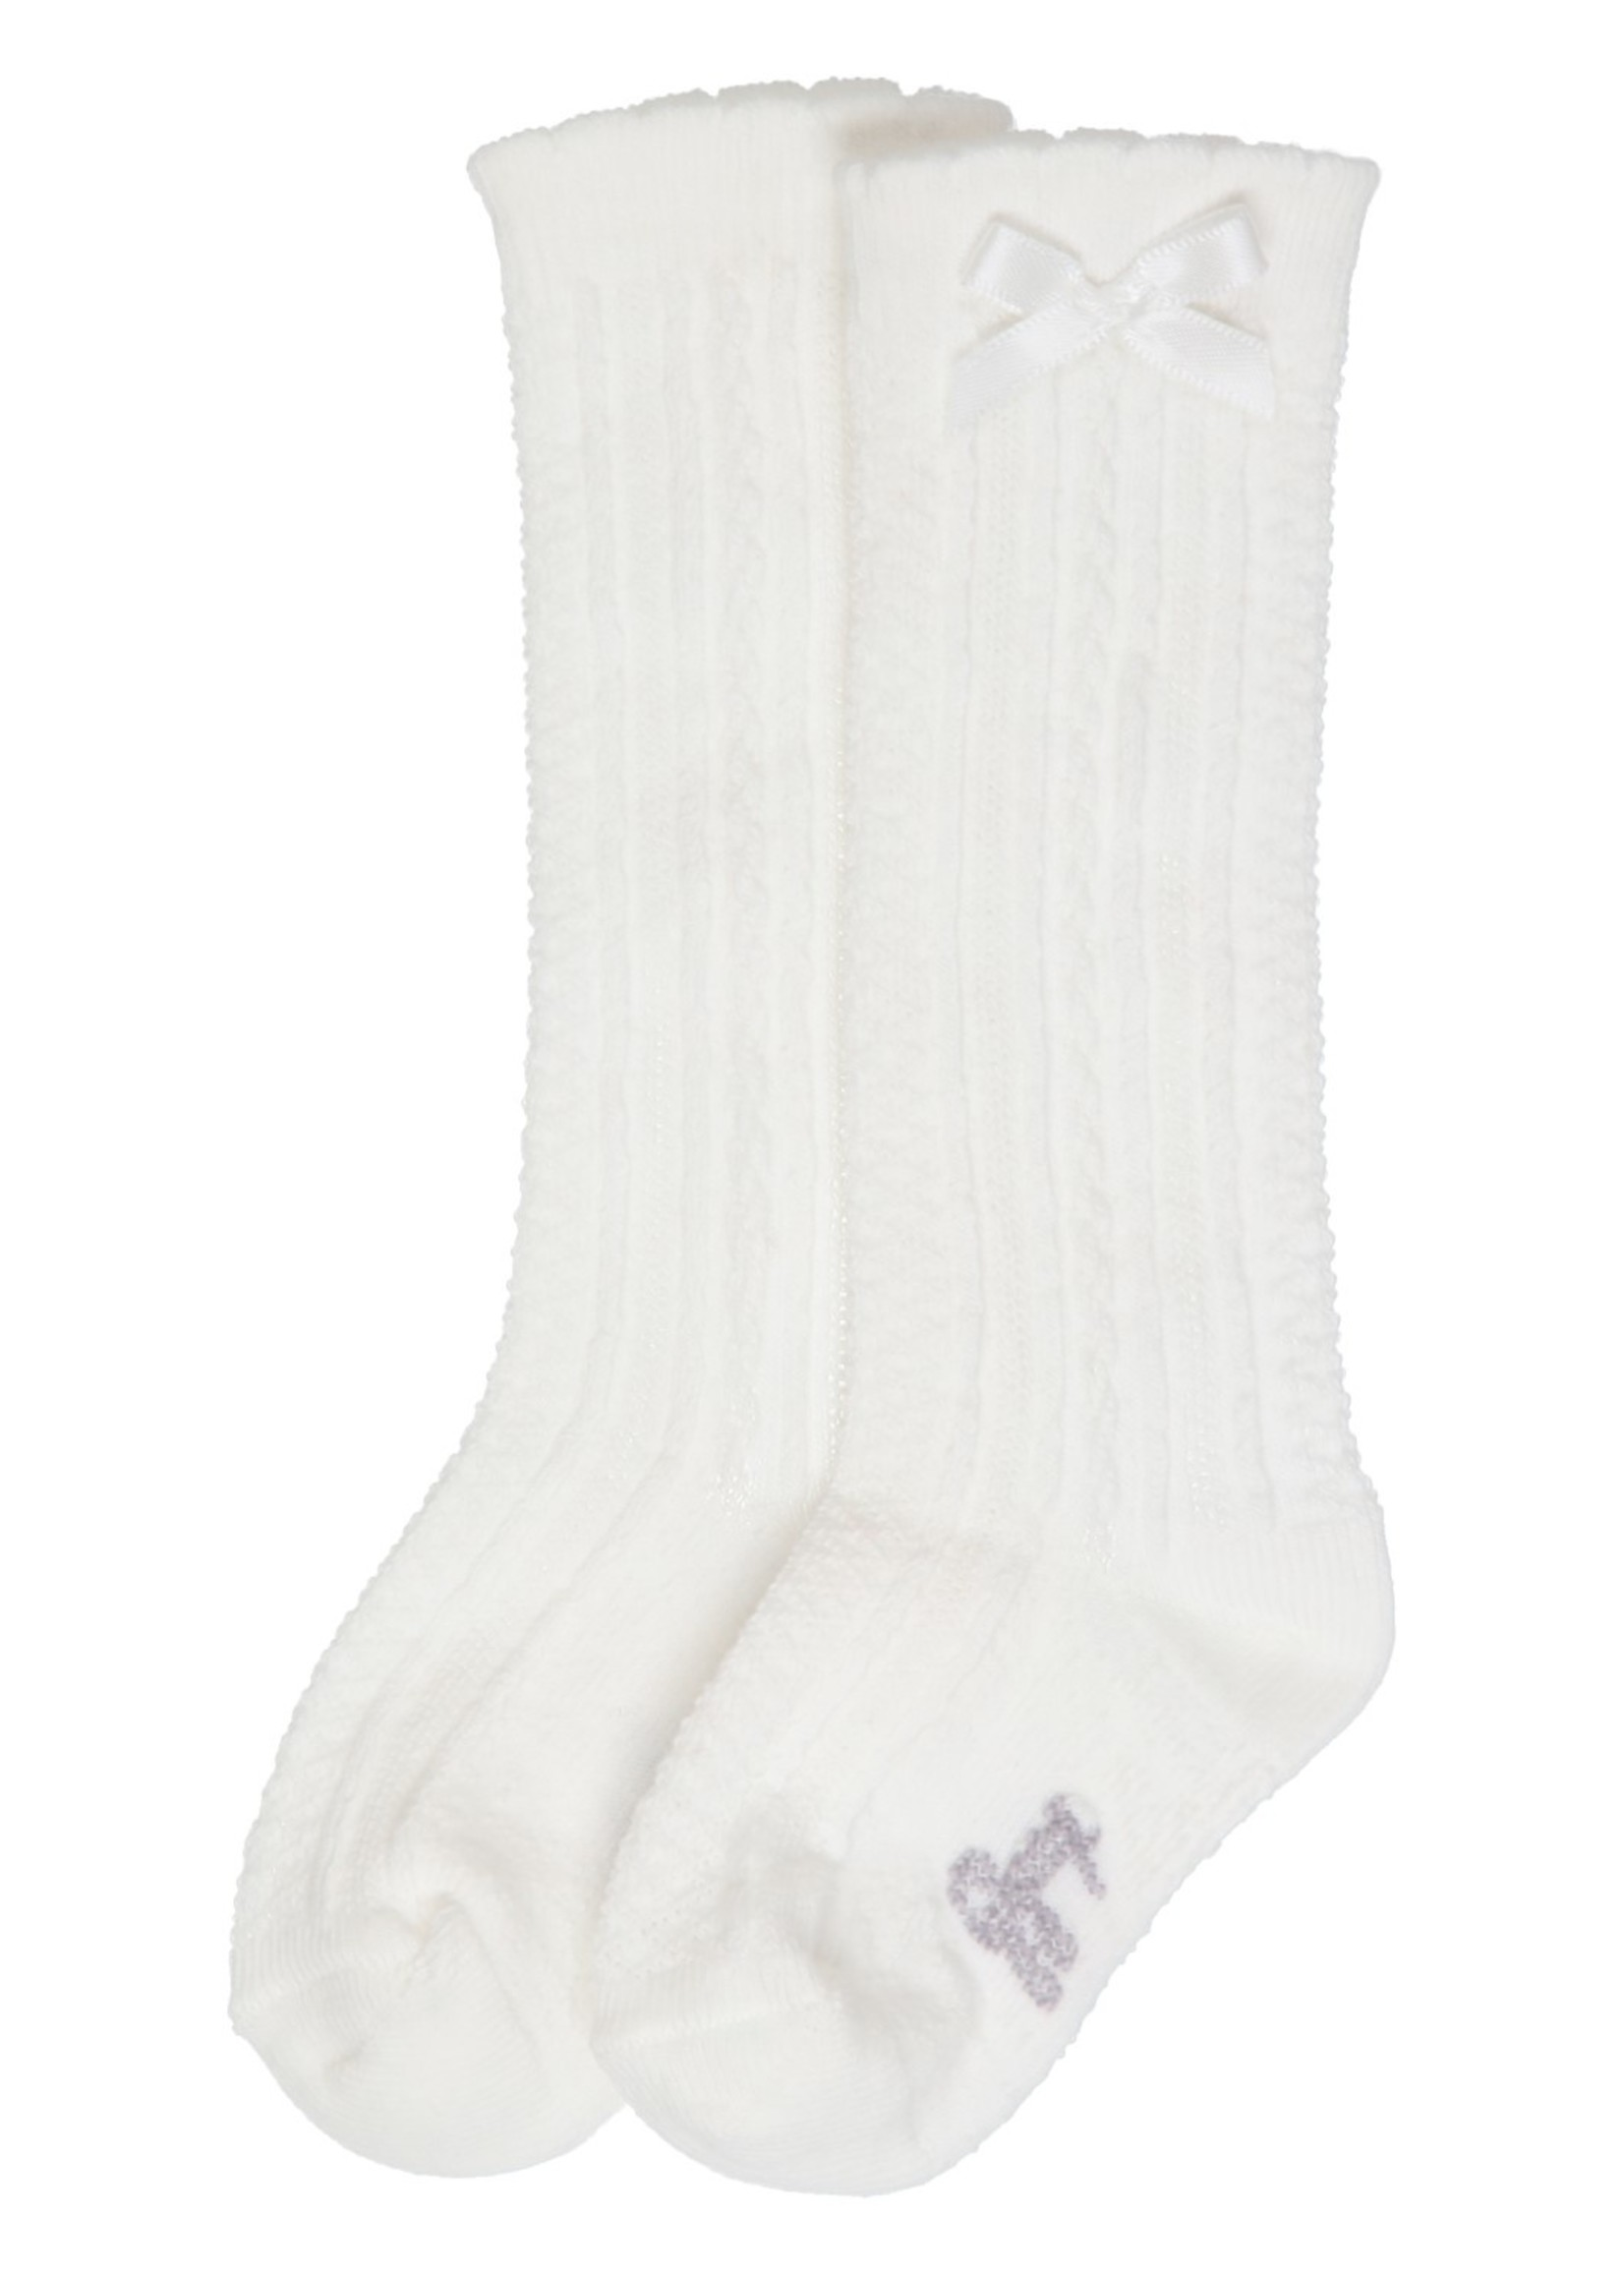 Gymp Gymp Girls knee socks offwhite